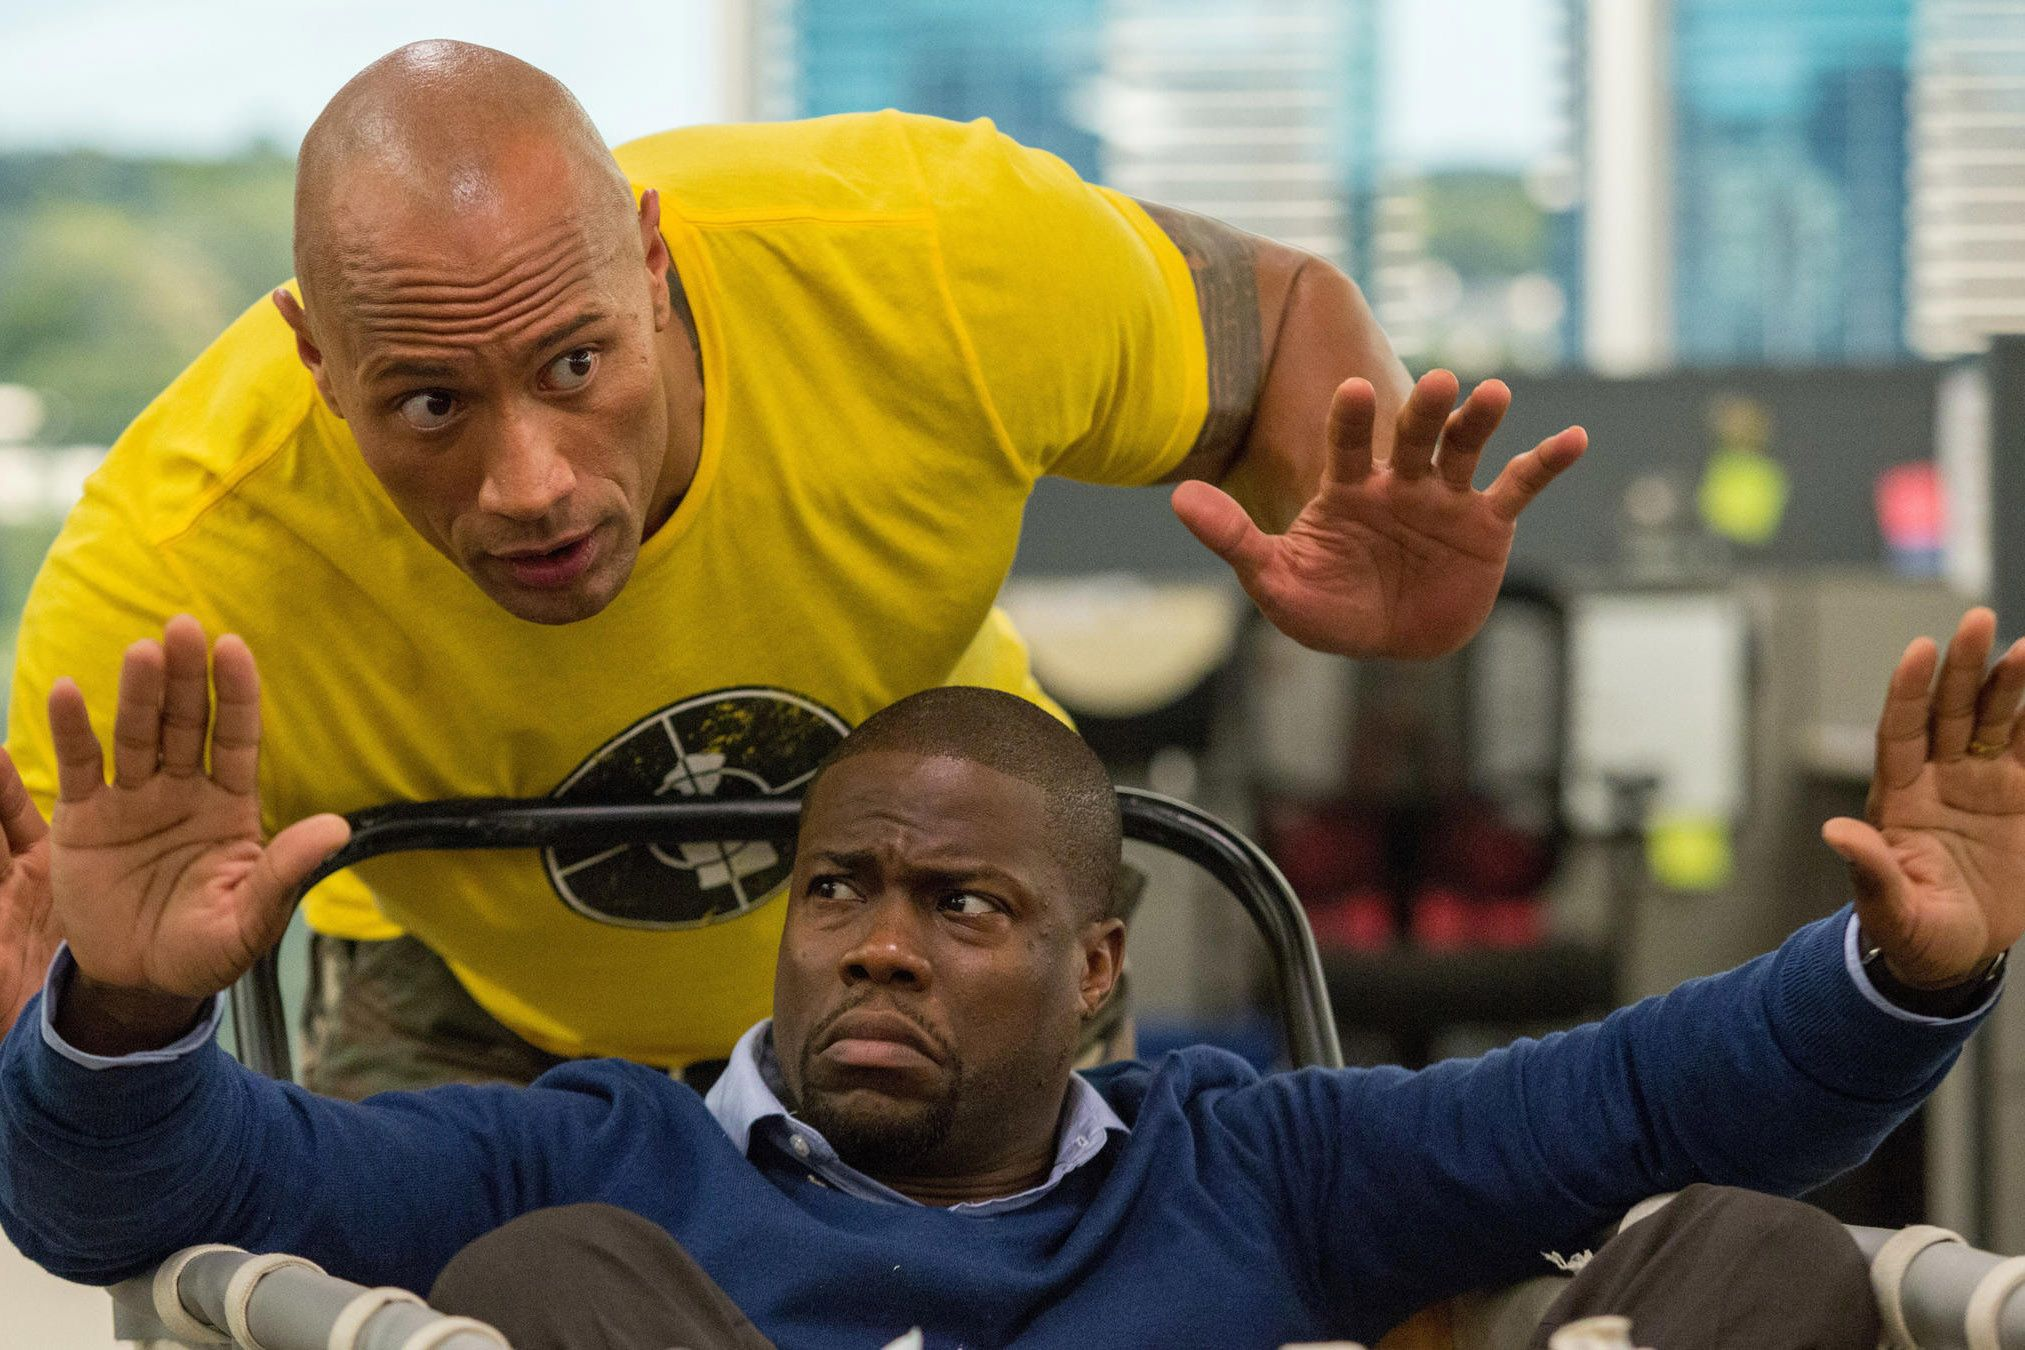 All Dwayne The Rock Johnson Movies Ranked from Jumanji to Moana